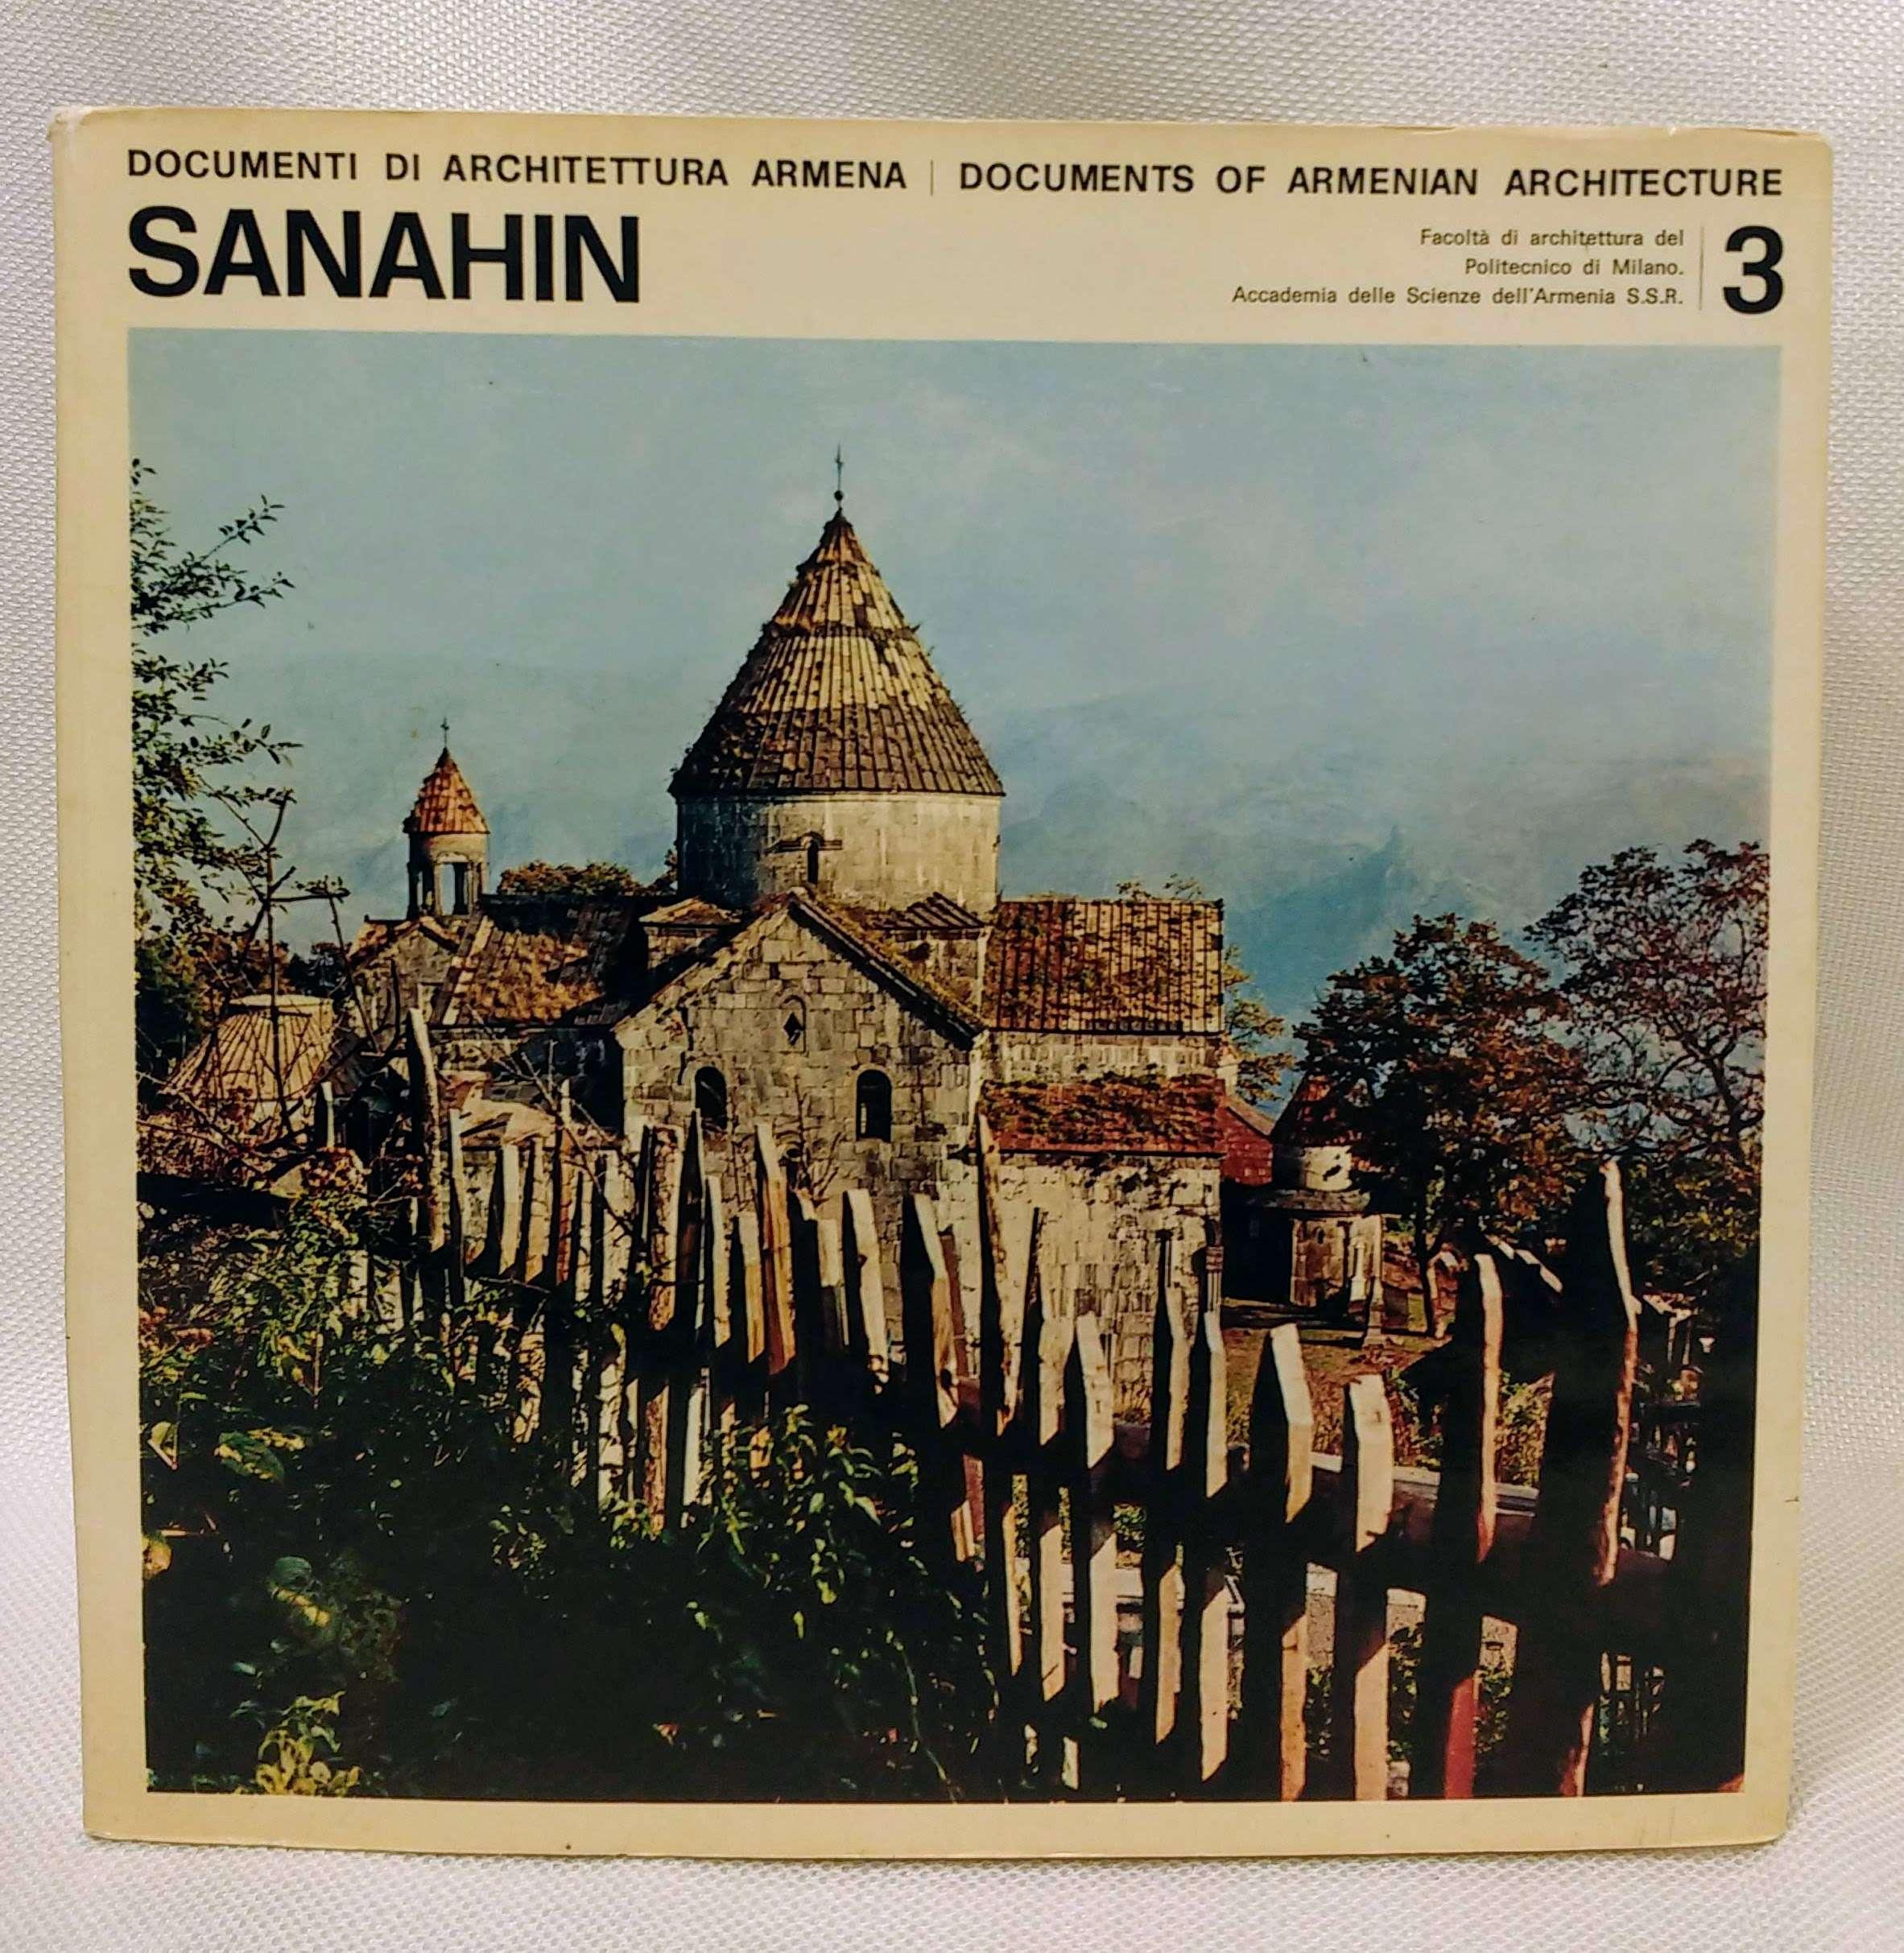 Documents of Armenian Architecture 3: Sanahin, Documents of Armenian Architecture